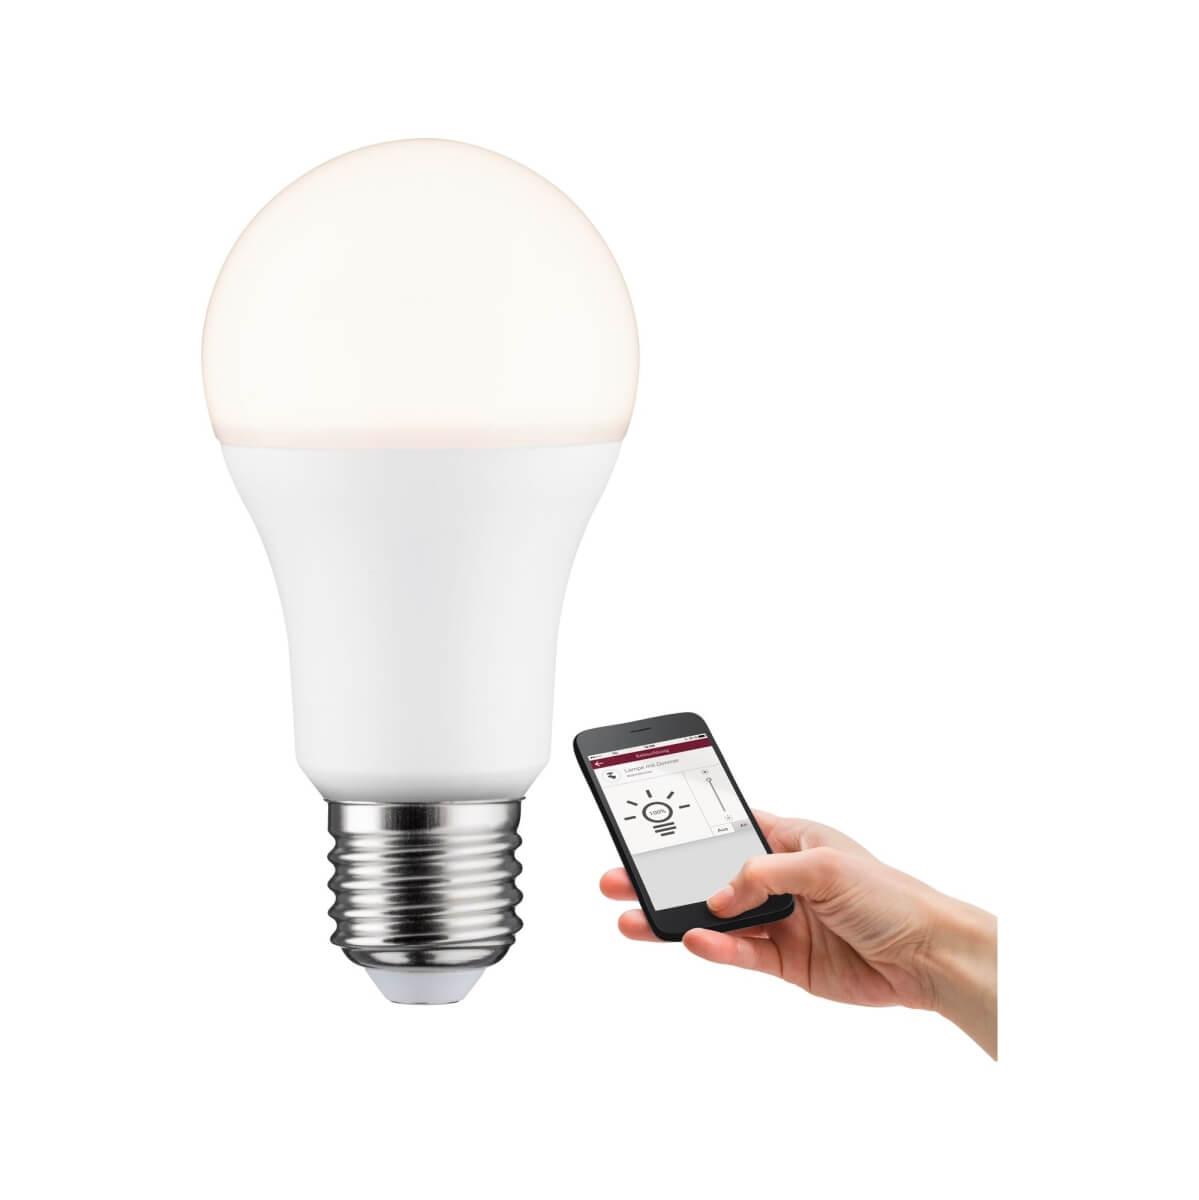 Paulmann Smart Home Zigbee LED 9W =9W, E9, 9 lm, Warmweiß 900k, 9  V, dimmbar